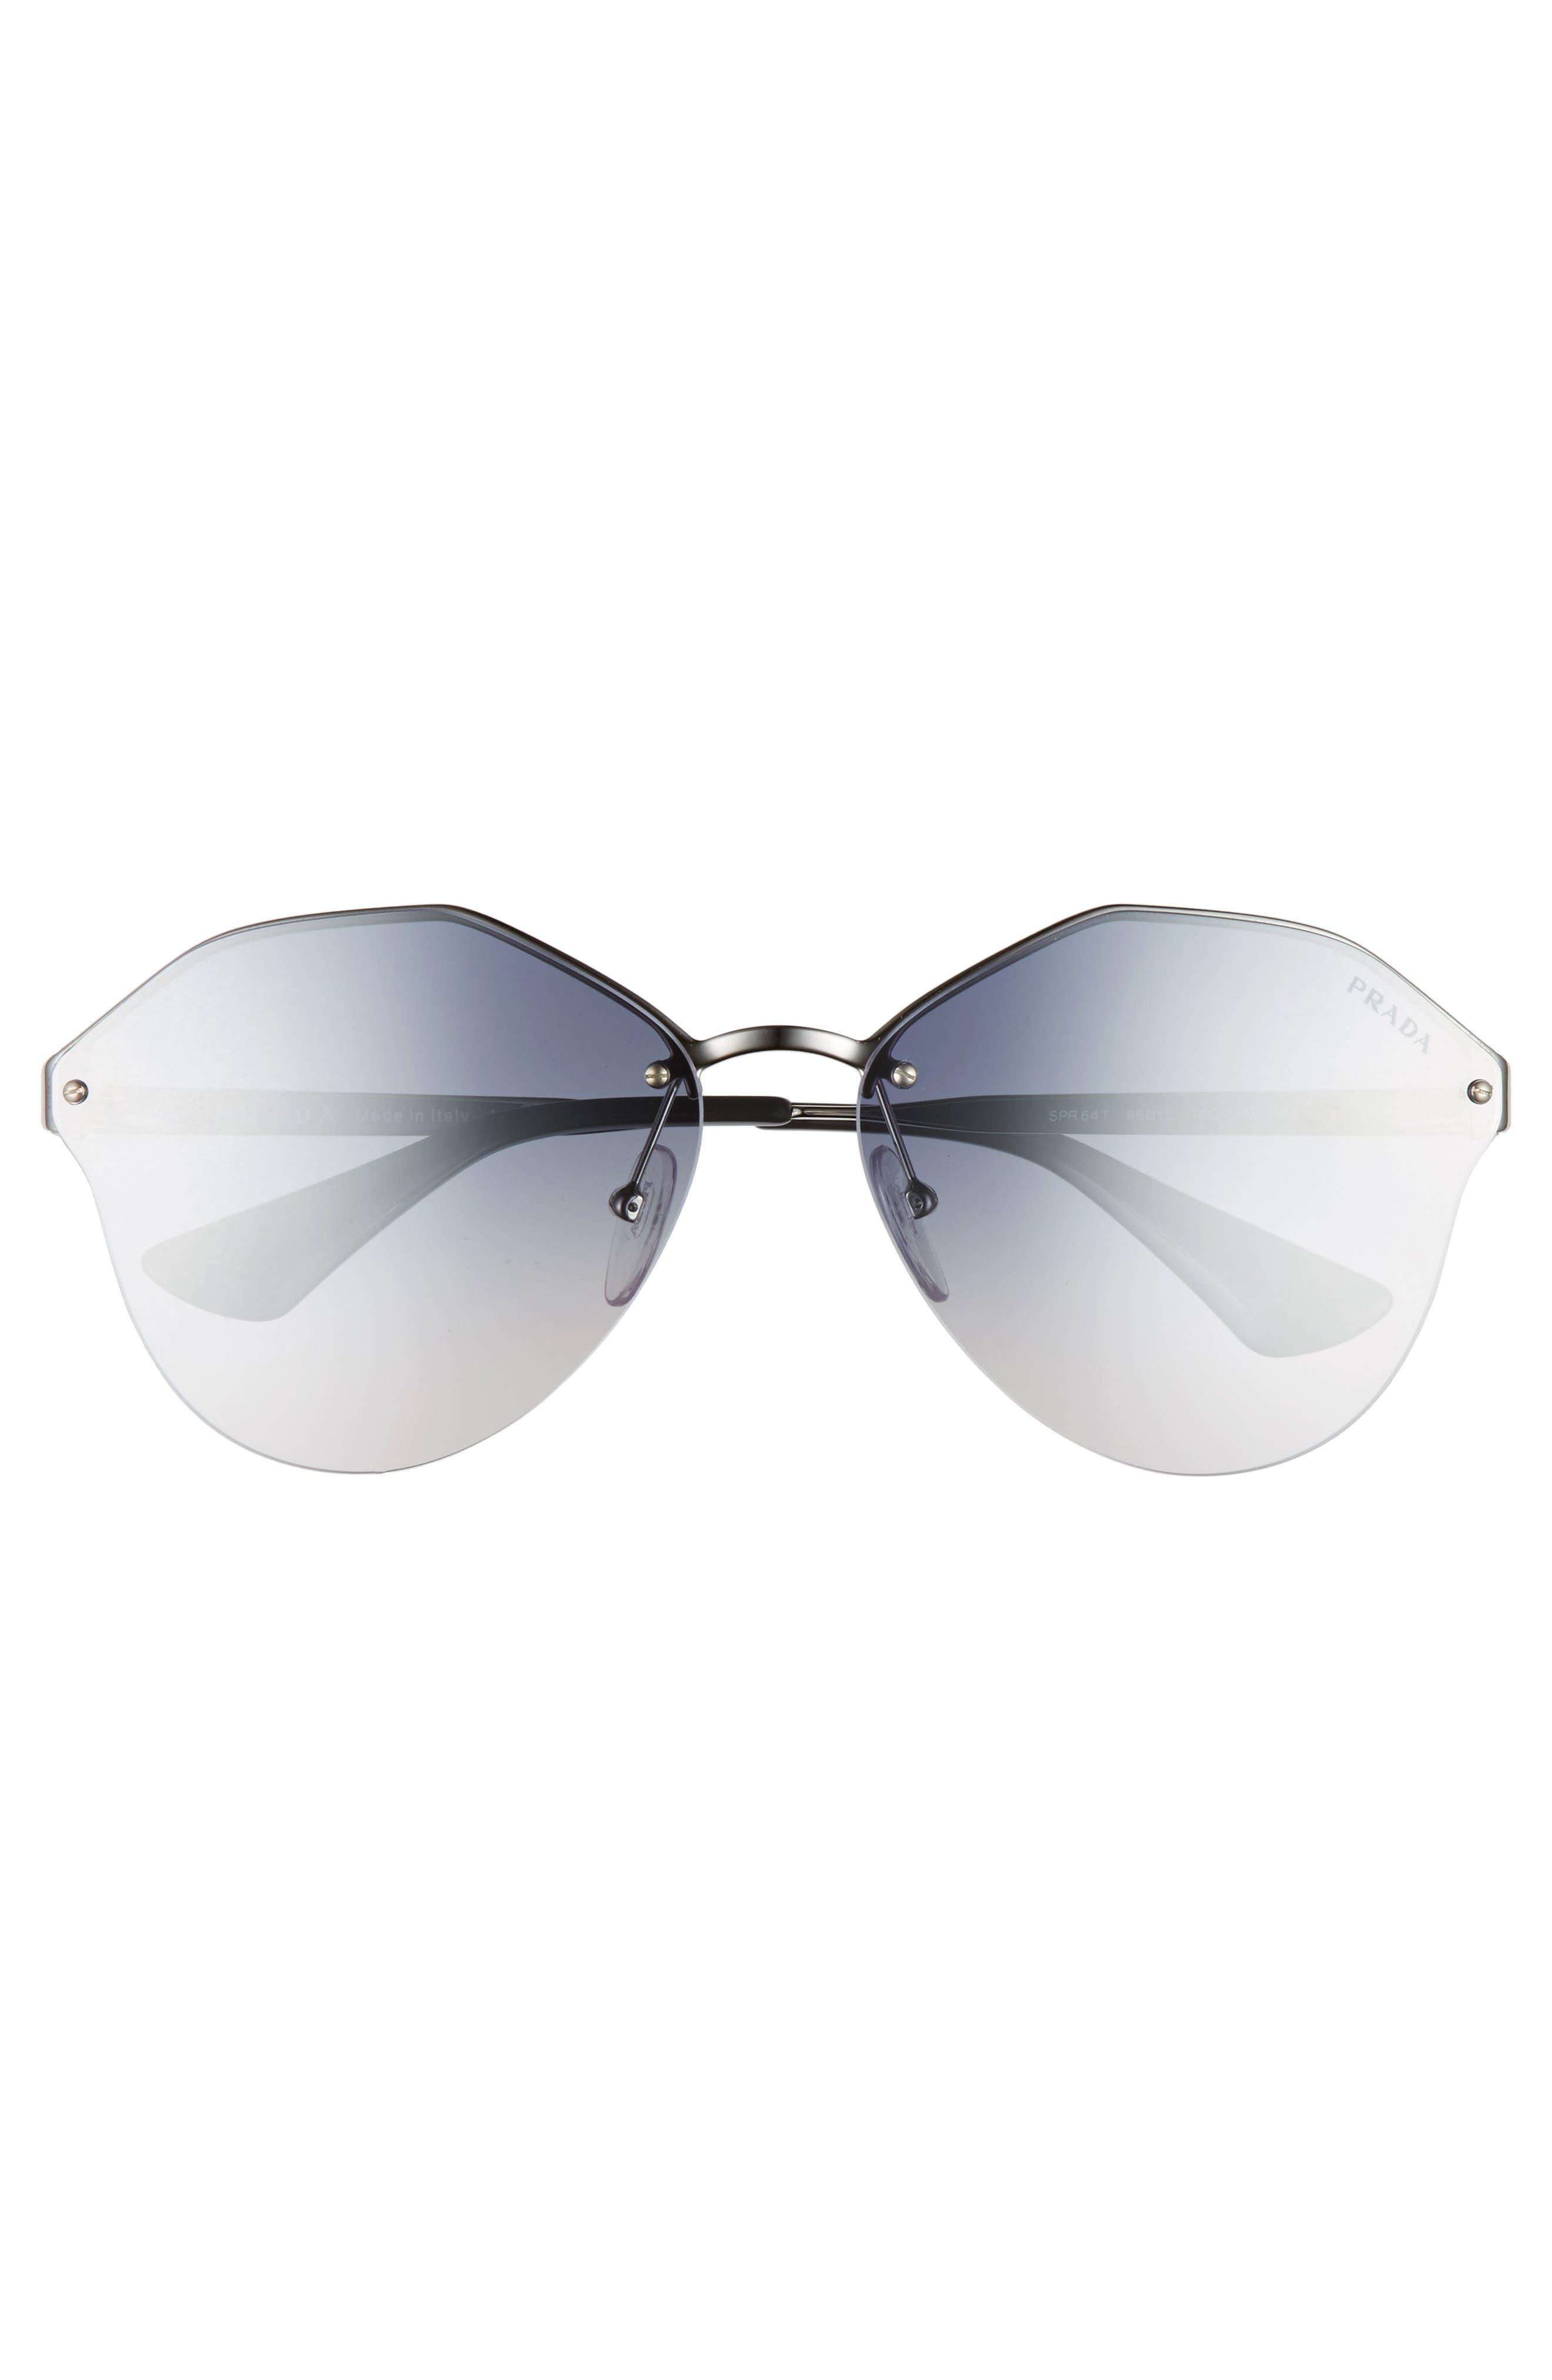 66mm Gradient Rimless Sunglasses,                             Alternate thumbnail 3, color,                             040